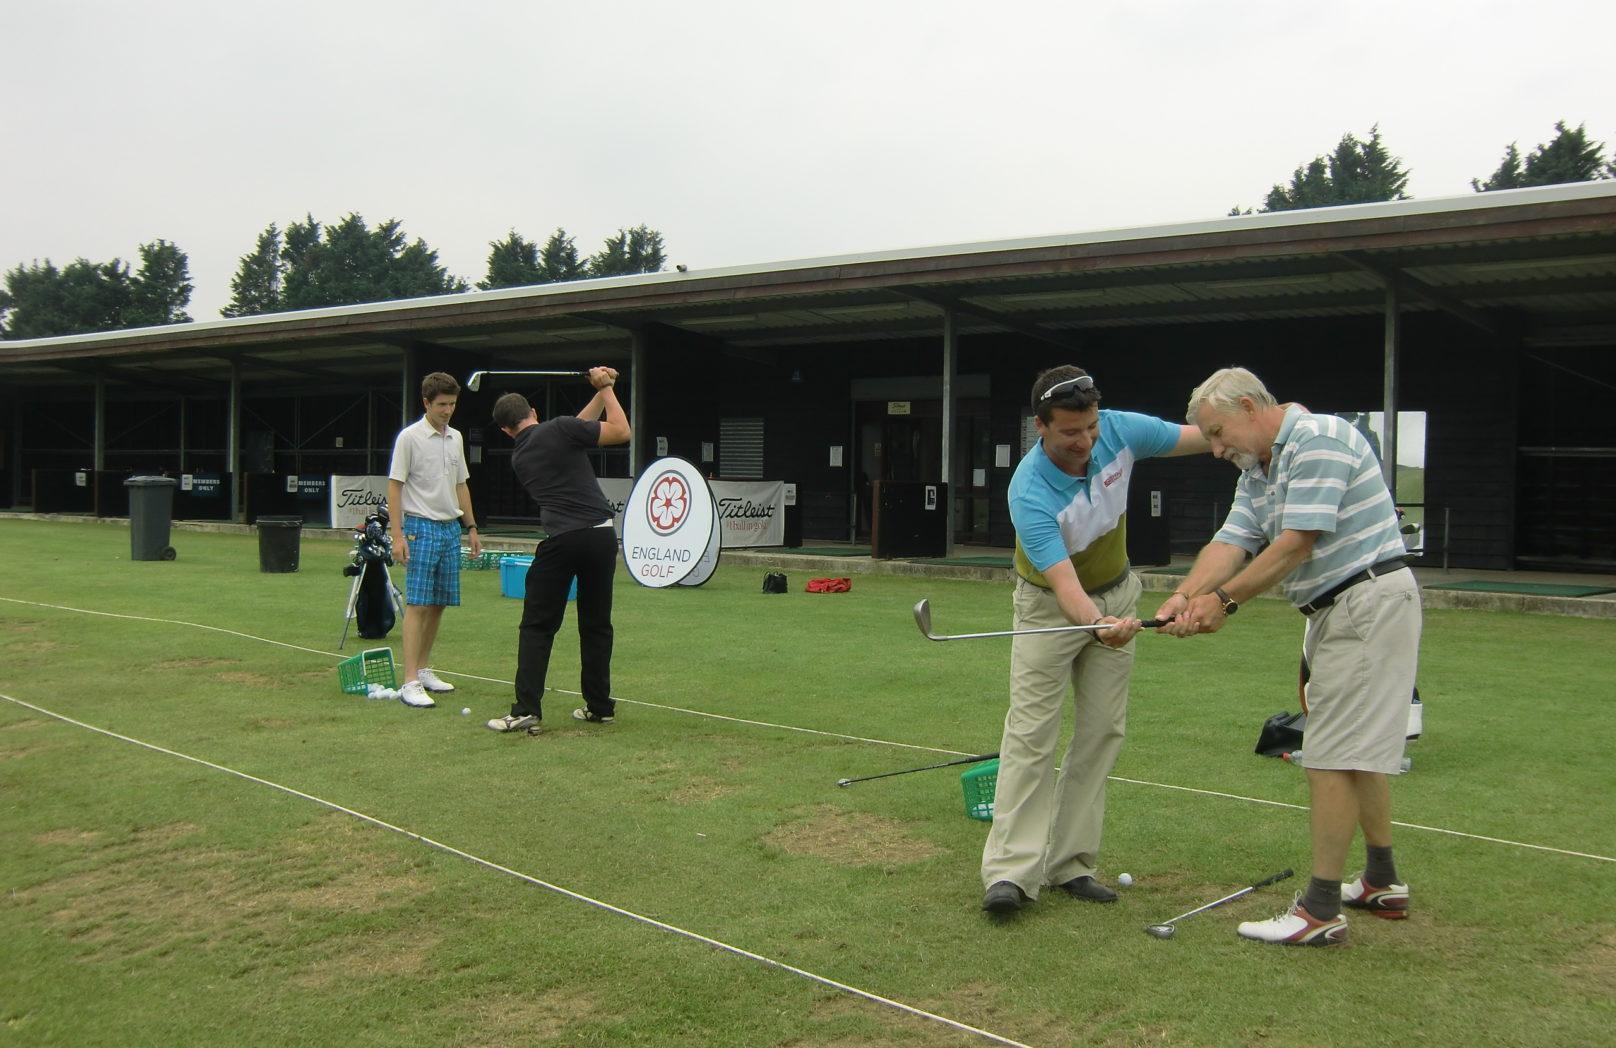 Member golfing events